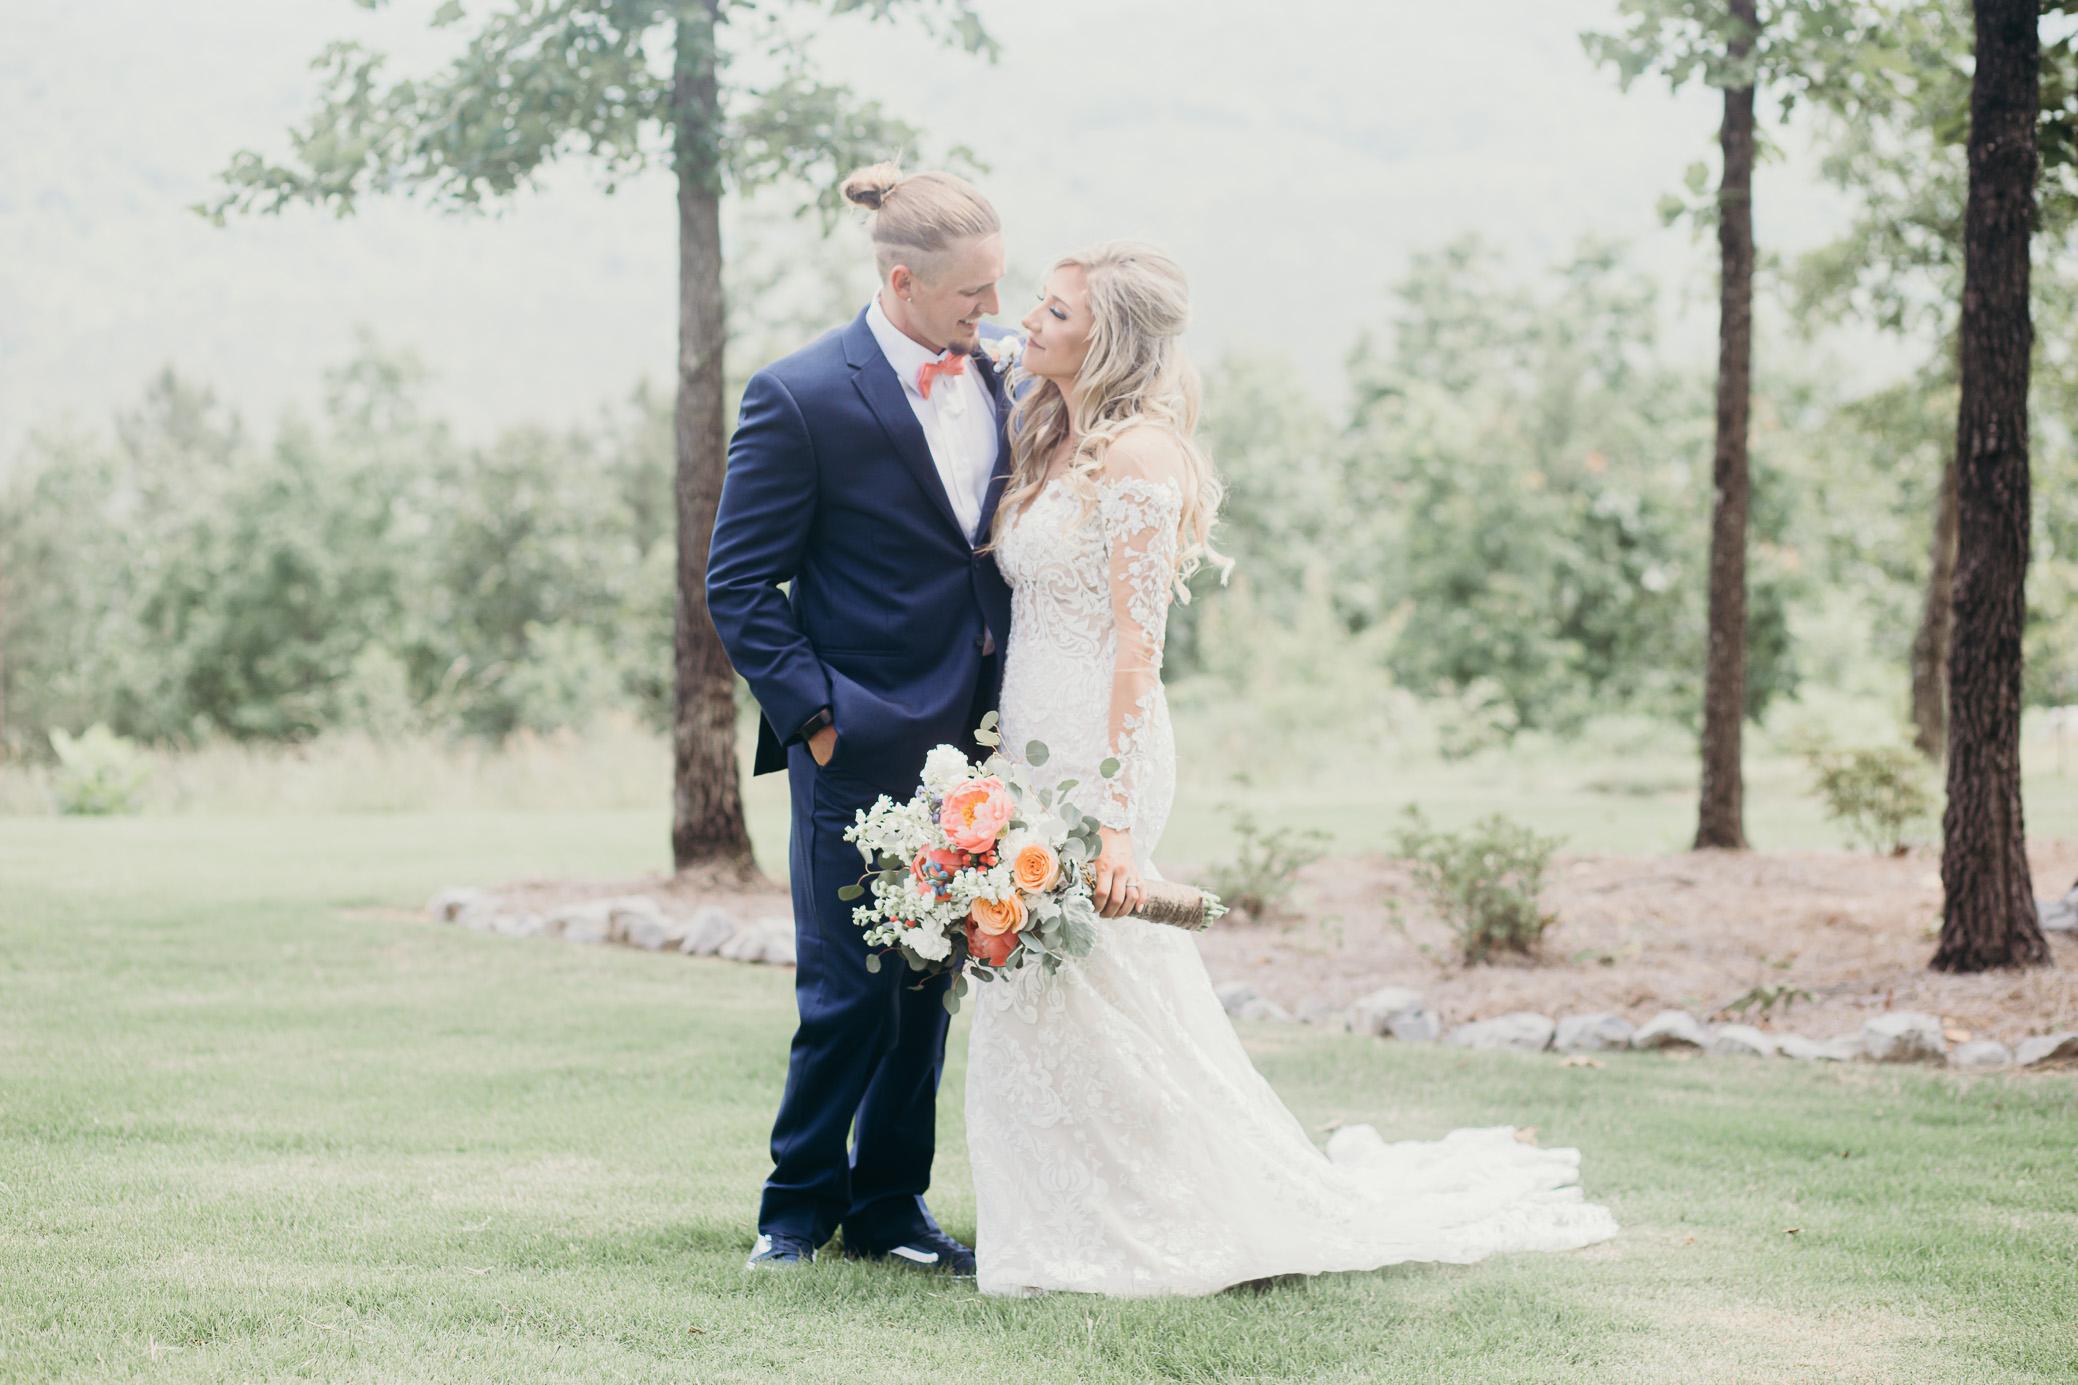 Charleston, South Carolina wedding photography and elopement photography pricing information